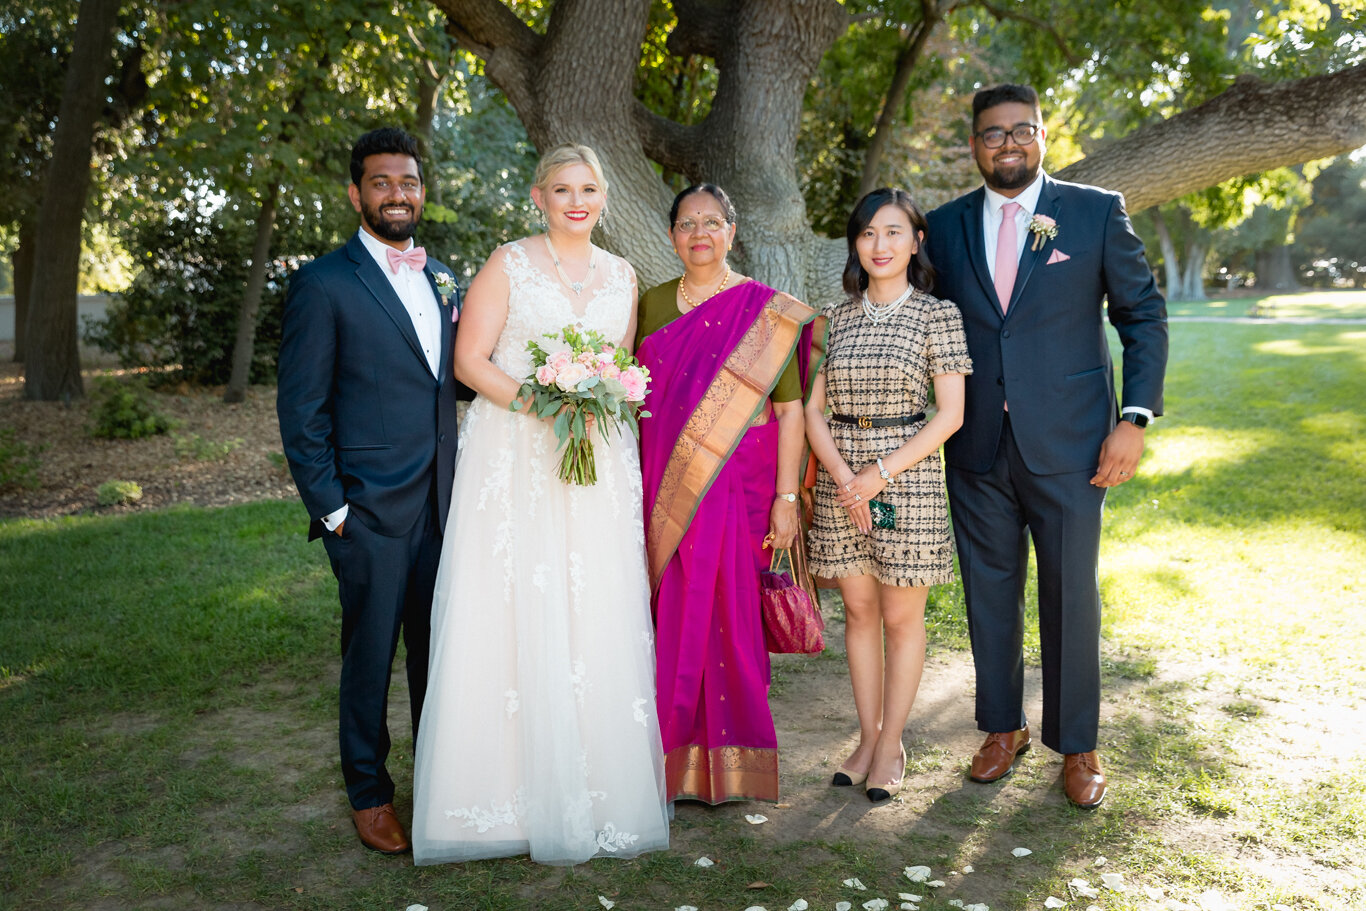 2019.08.24_Emily-Ashir-Wedding-at-the-Maples-5949.jpg